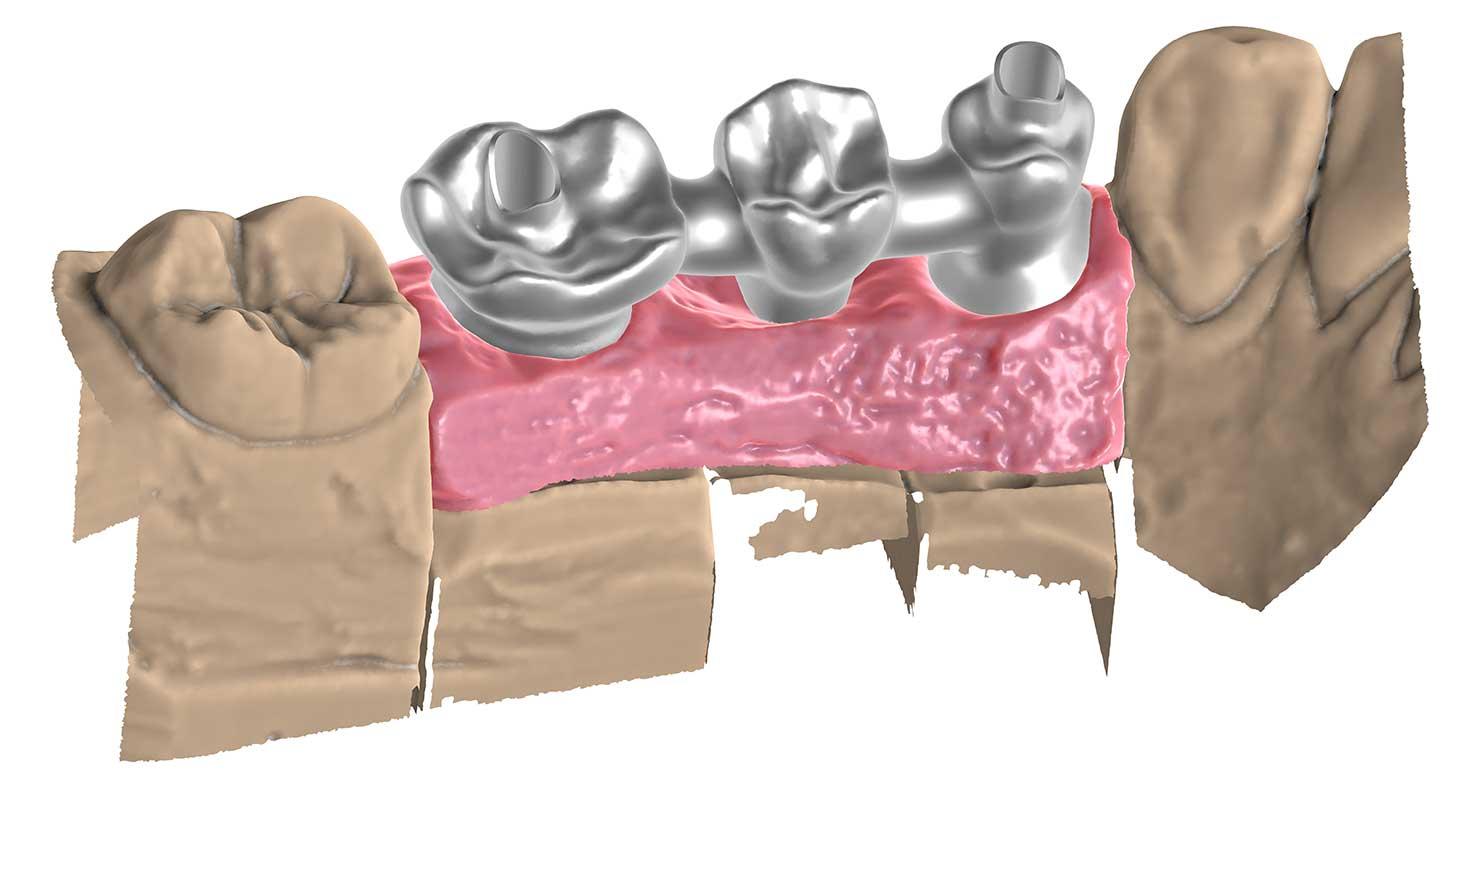 Most na implantach